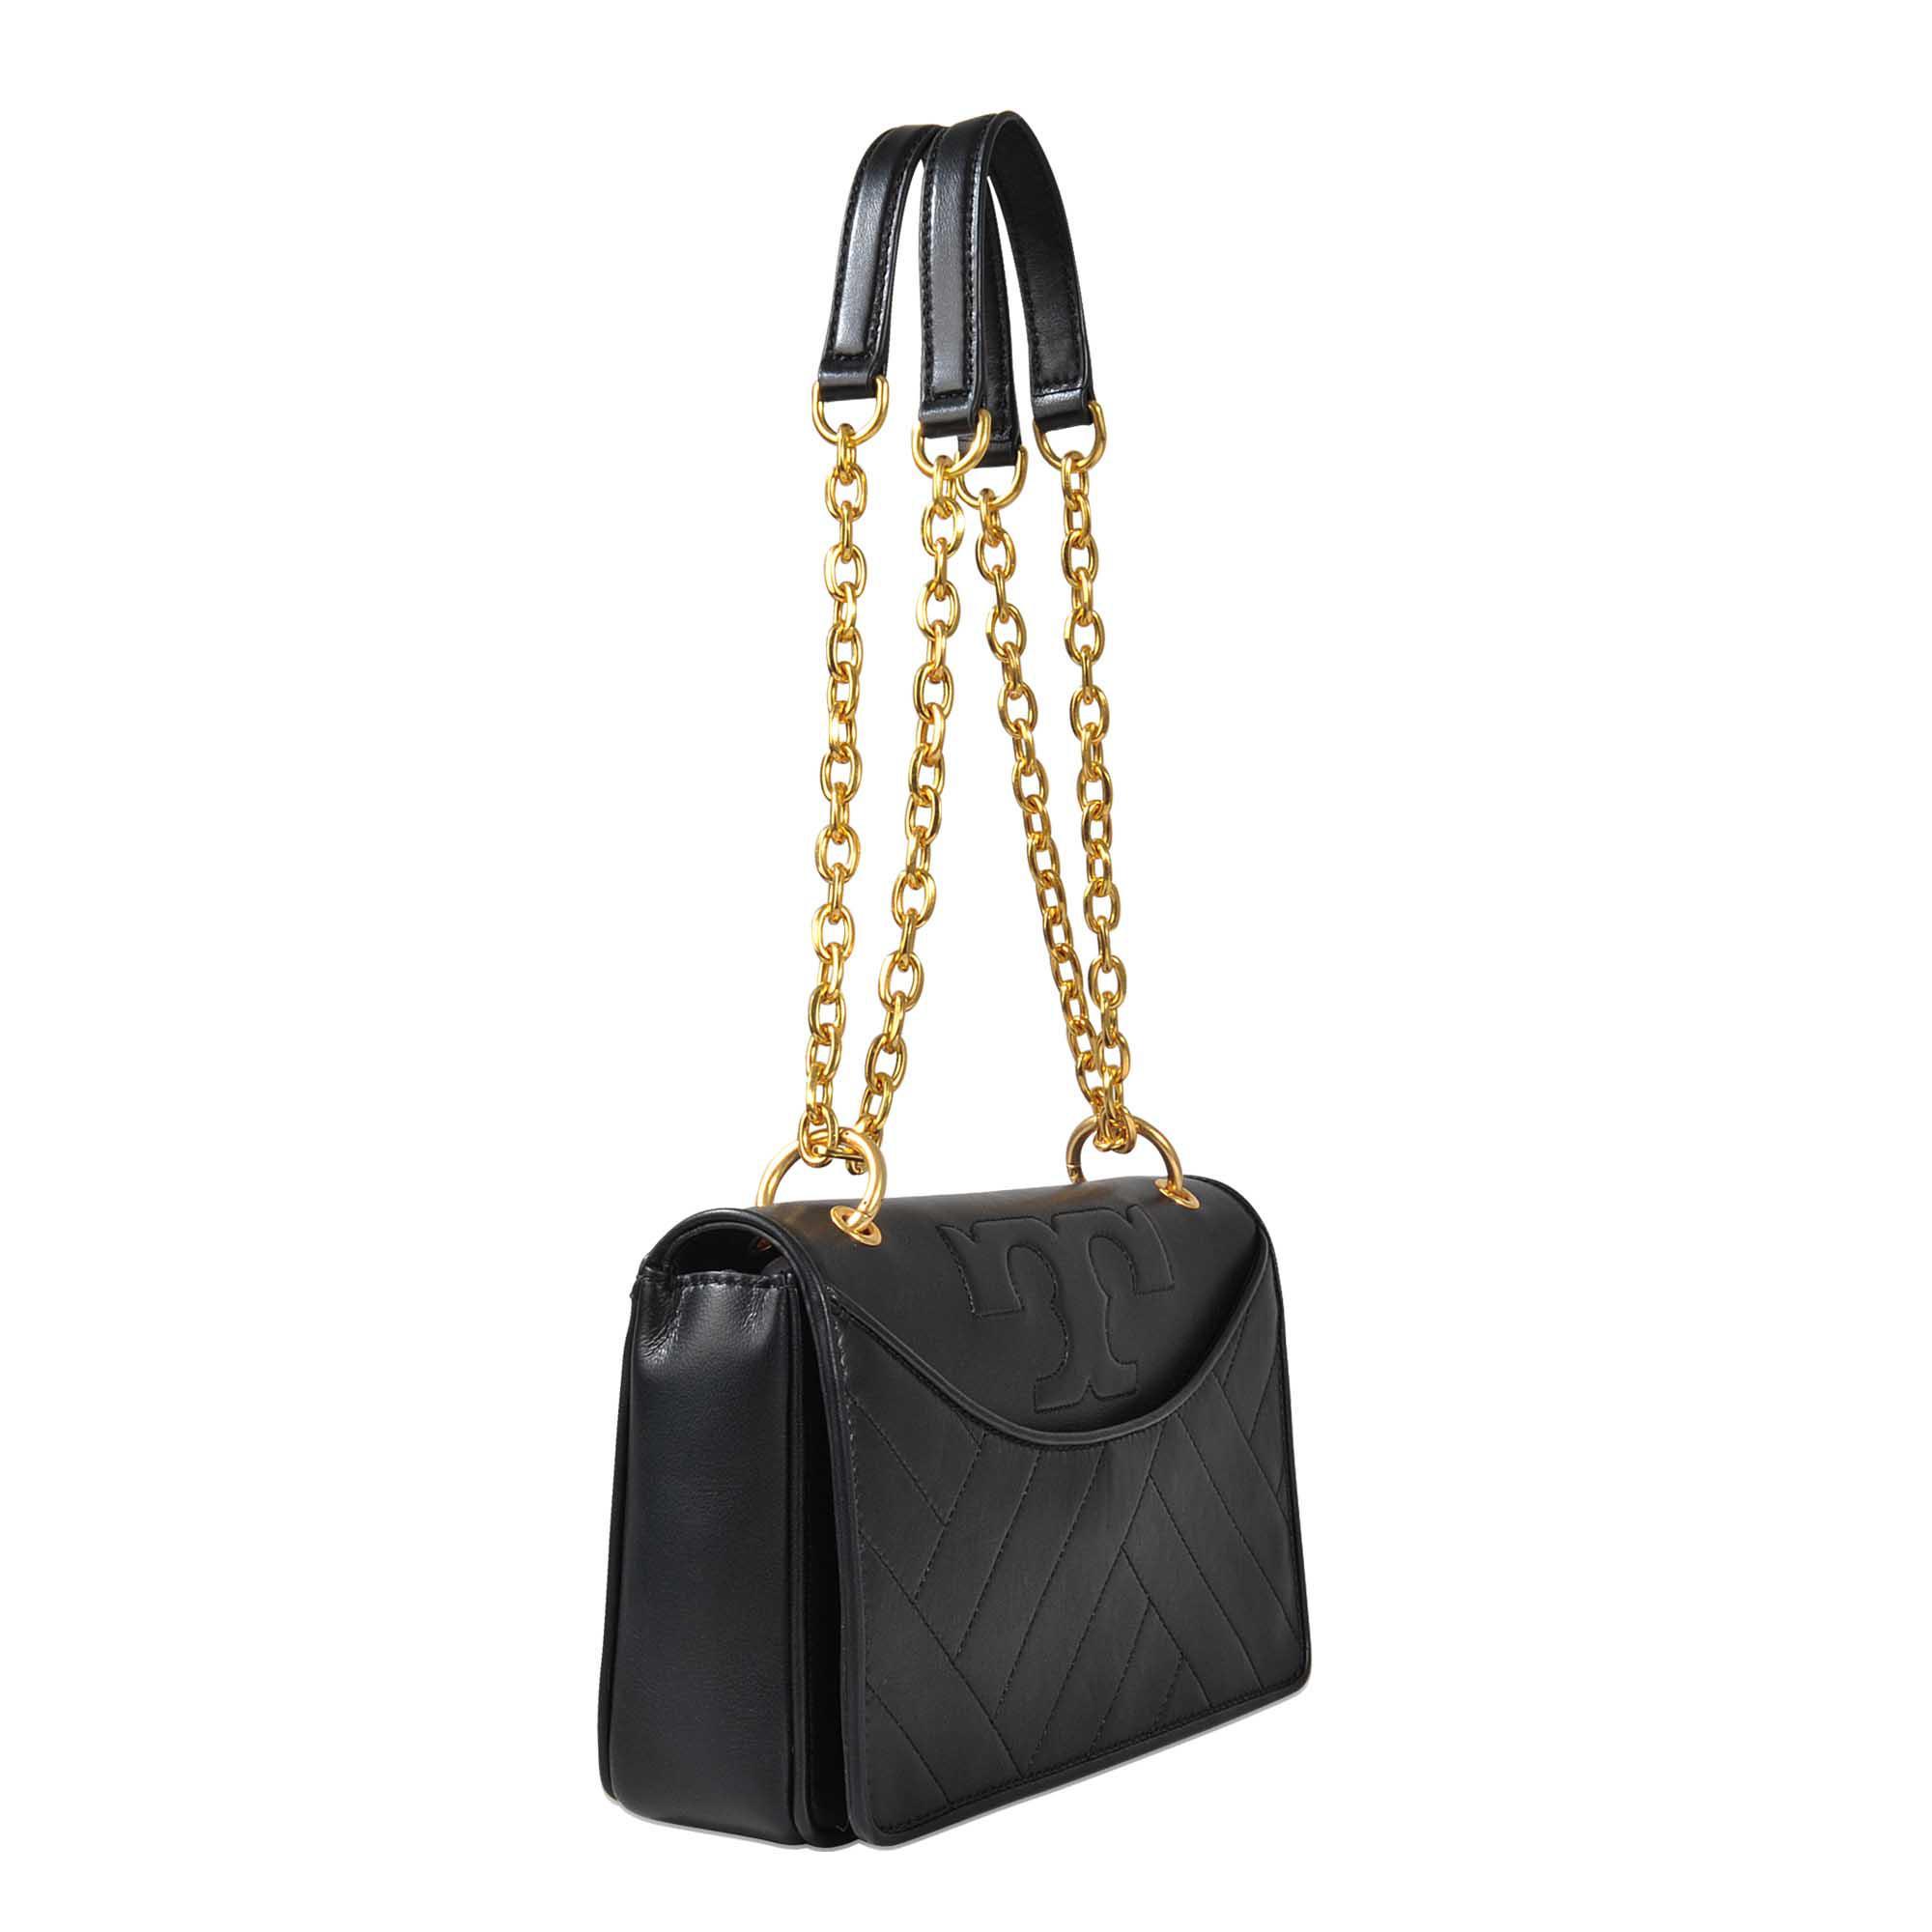 b53205064e Tory Burch Alexa Convertible Shoulder Bag in Black - Lyst